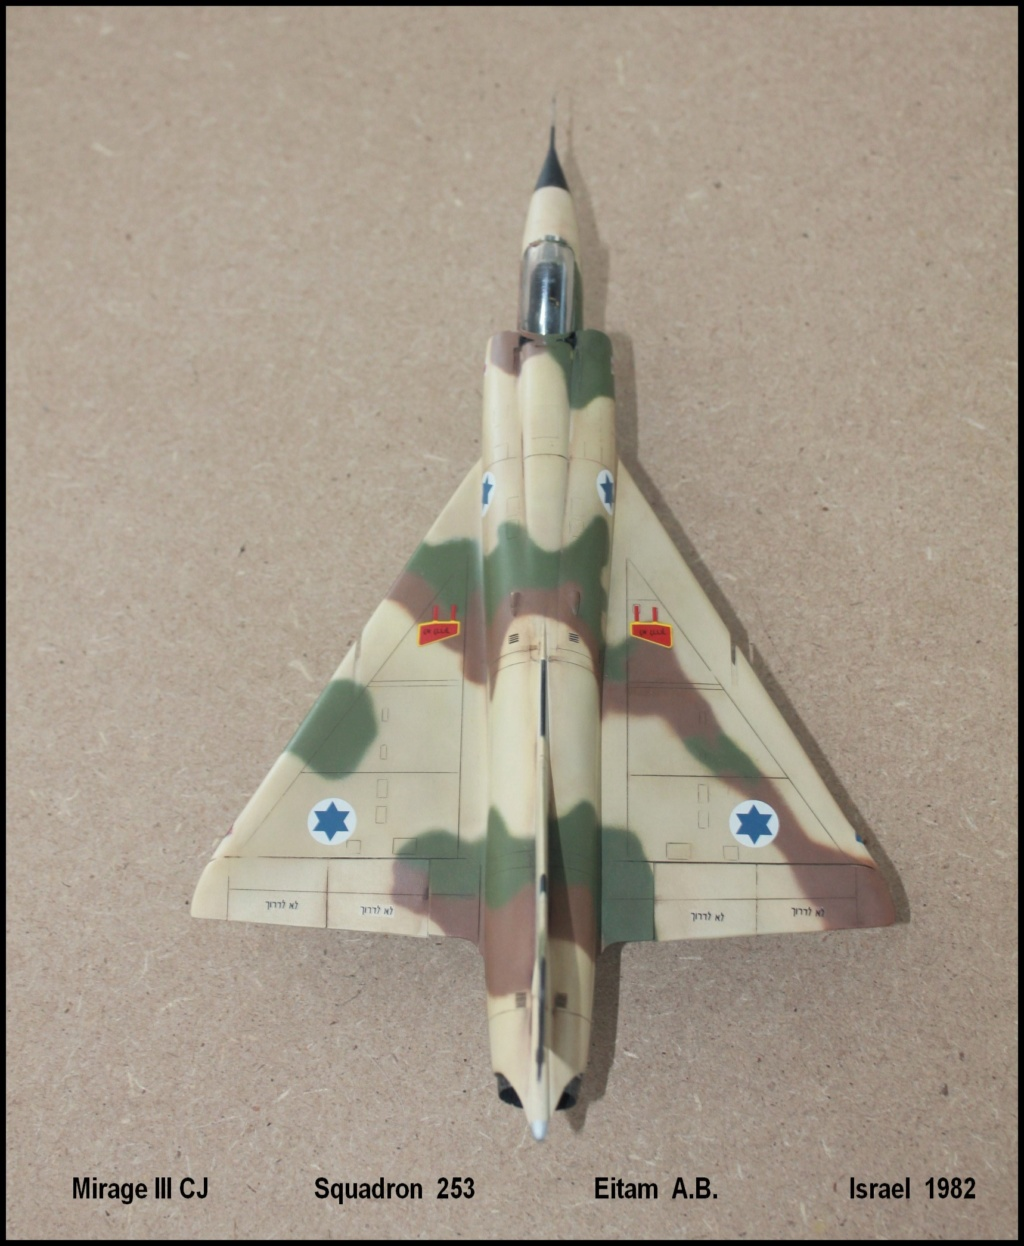 Mirage III CJ  SHAHAK   I.D.F Miiicj16